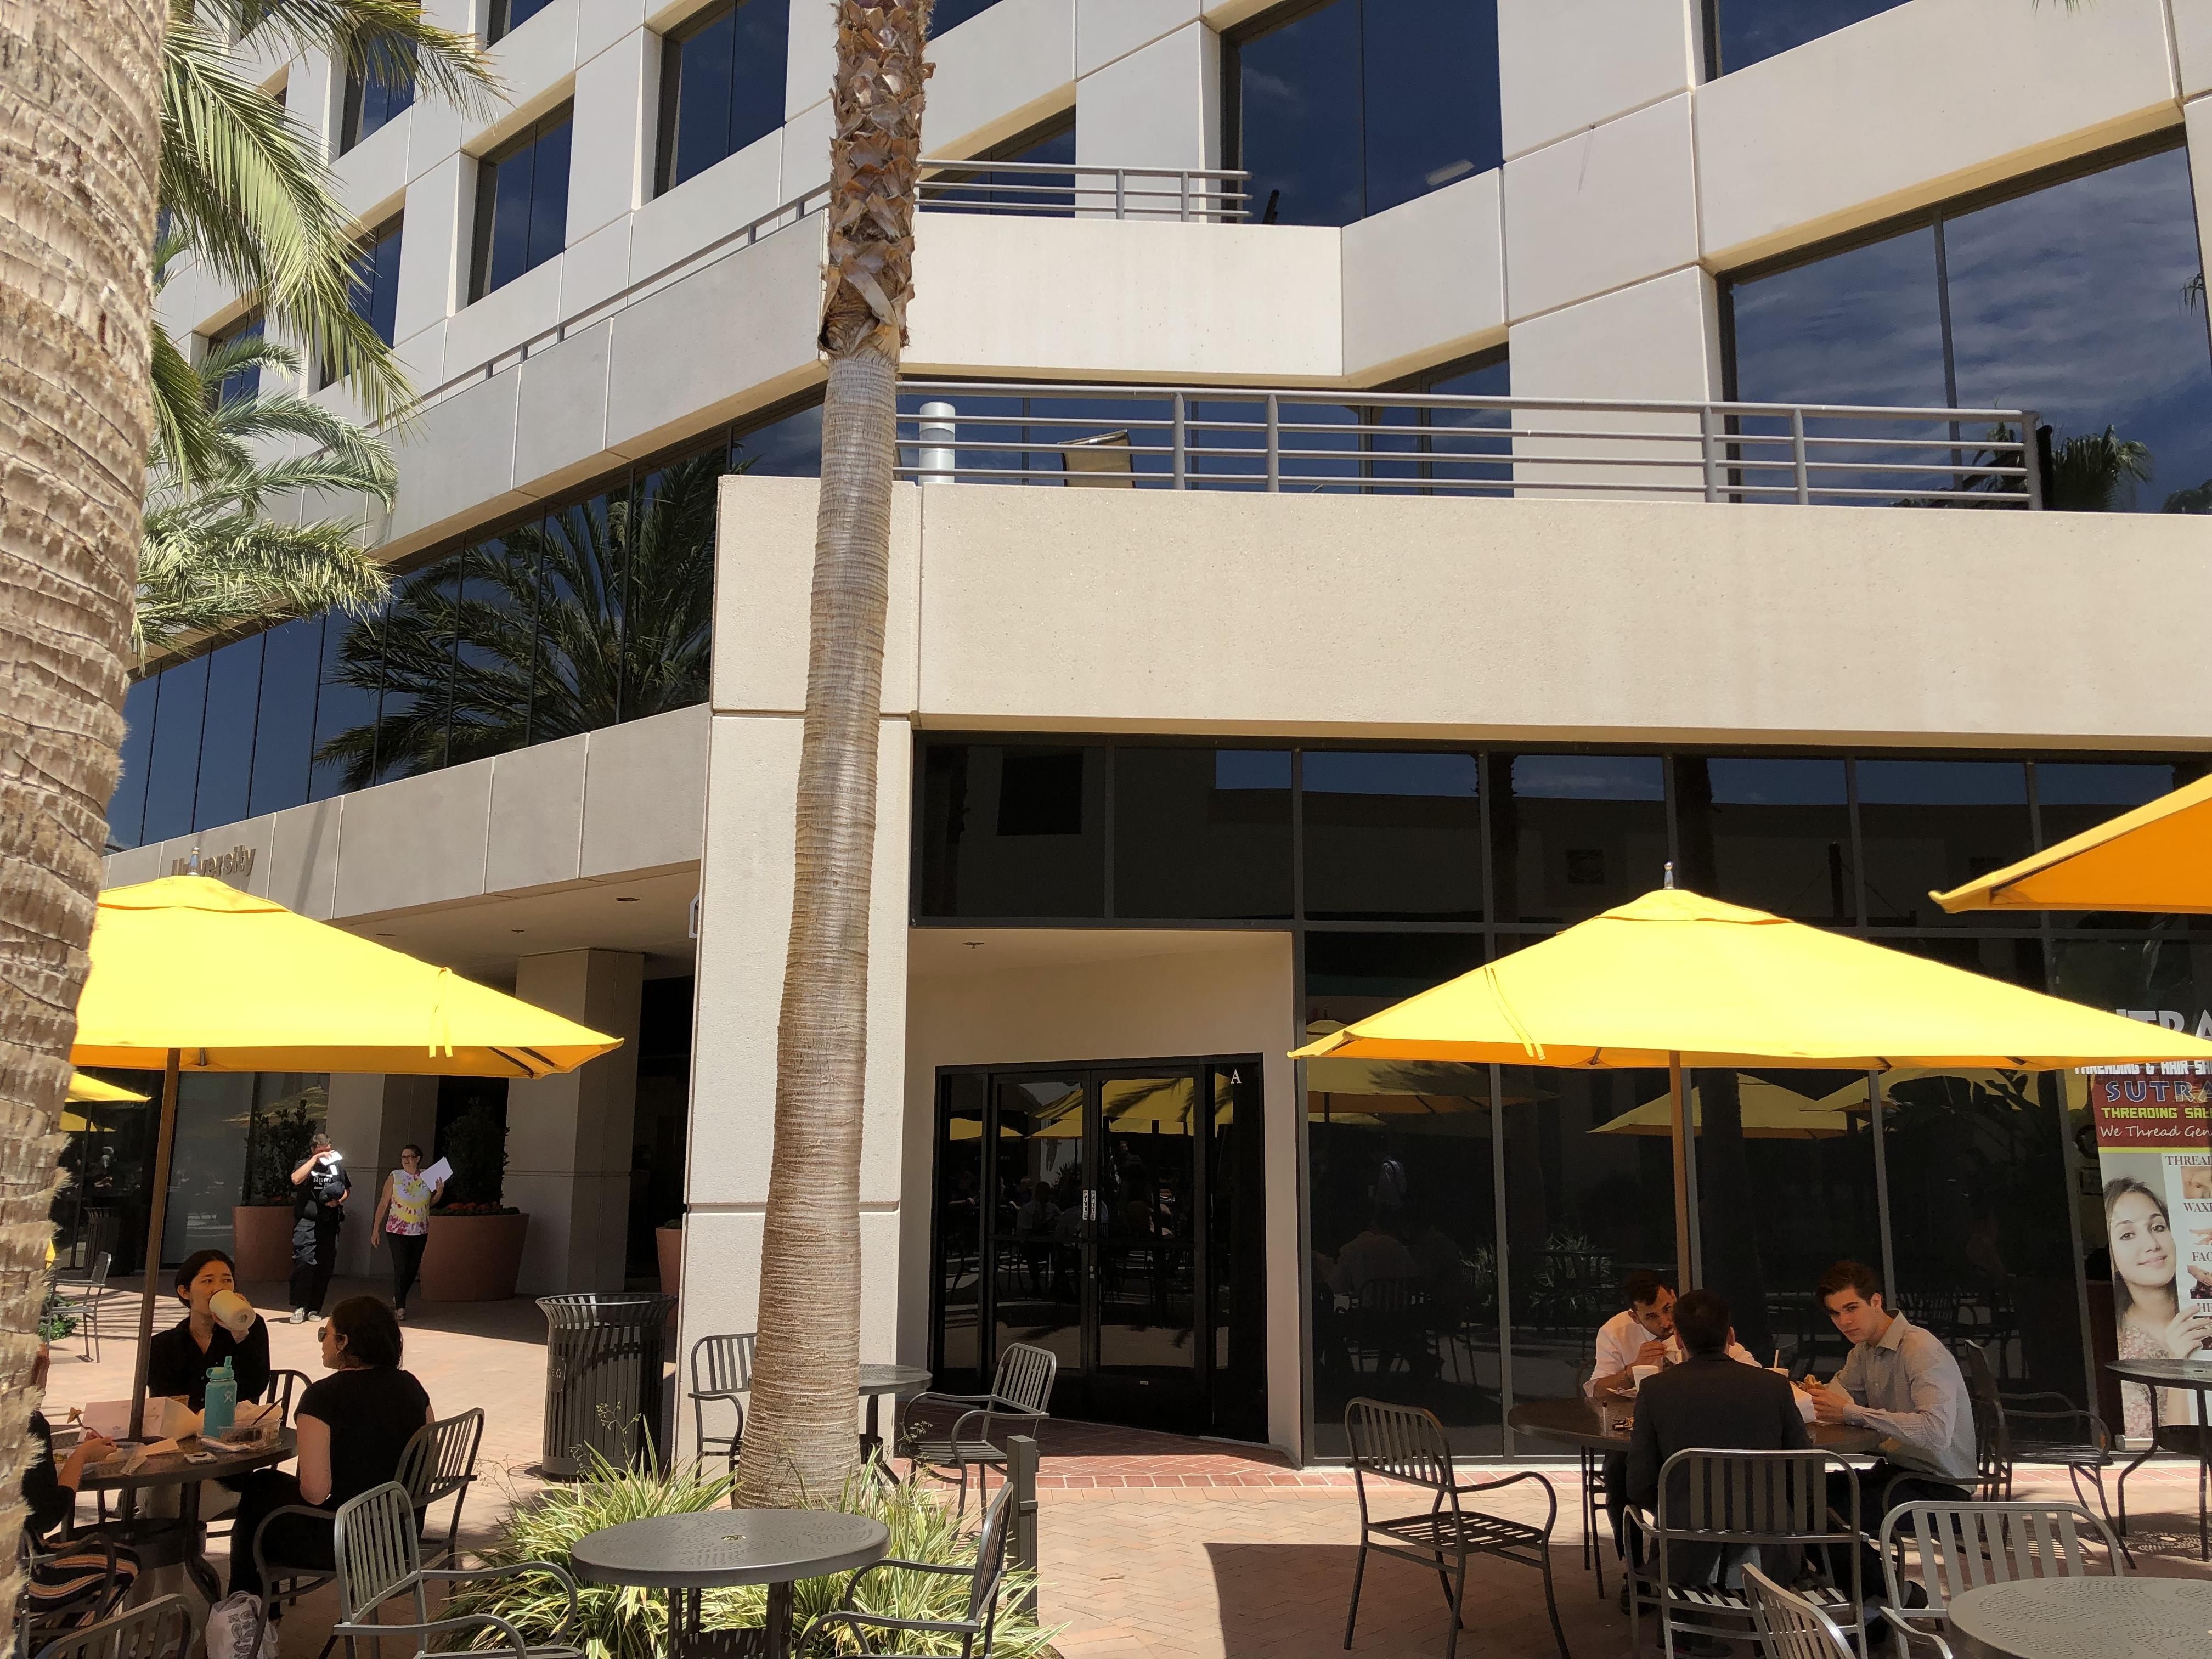 Campus English Academy Irvine University Center